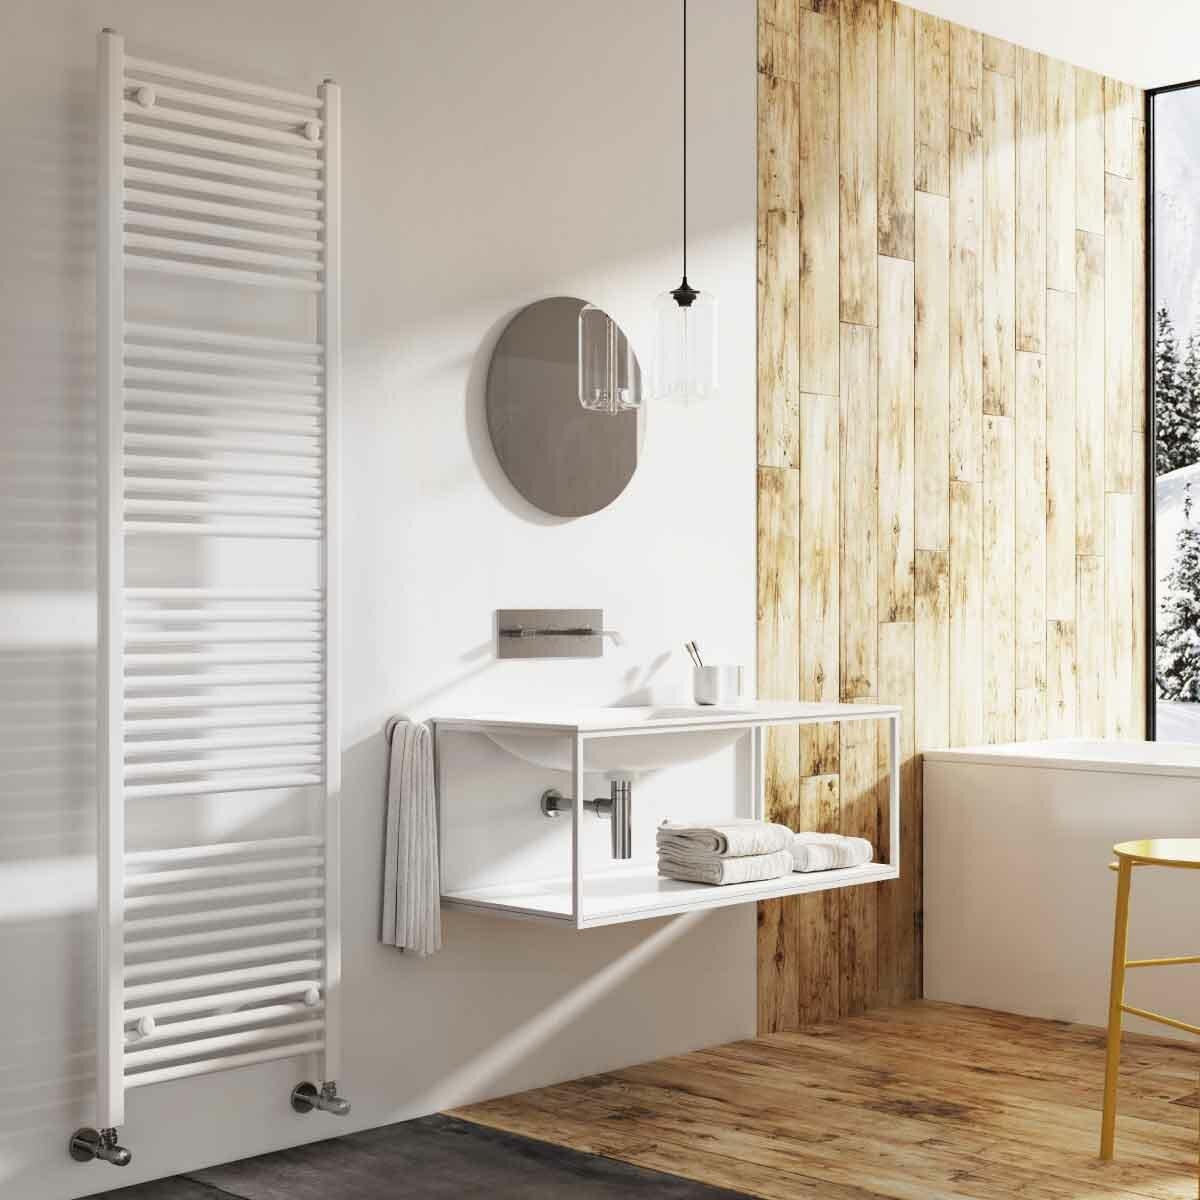 Akenside Vertical Straight Towel Rail Radiator